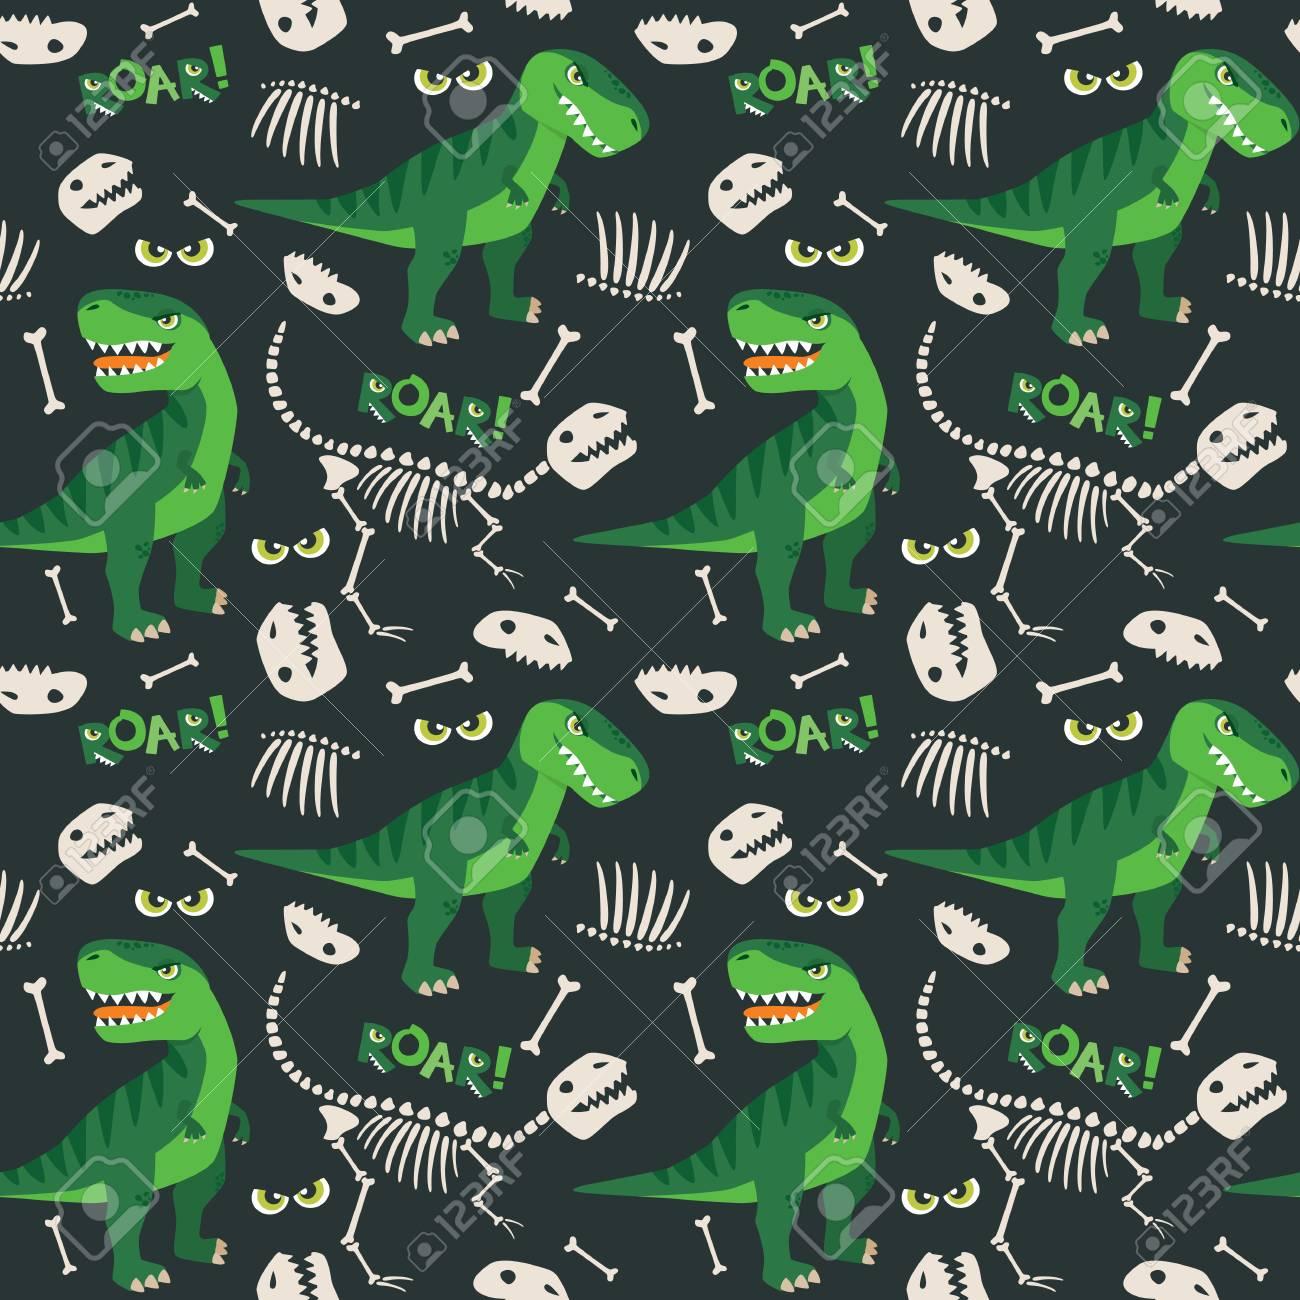 T Rex and Dino Bones Seamless Pattern - 95446119